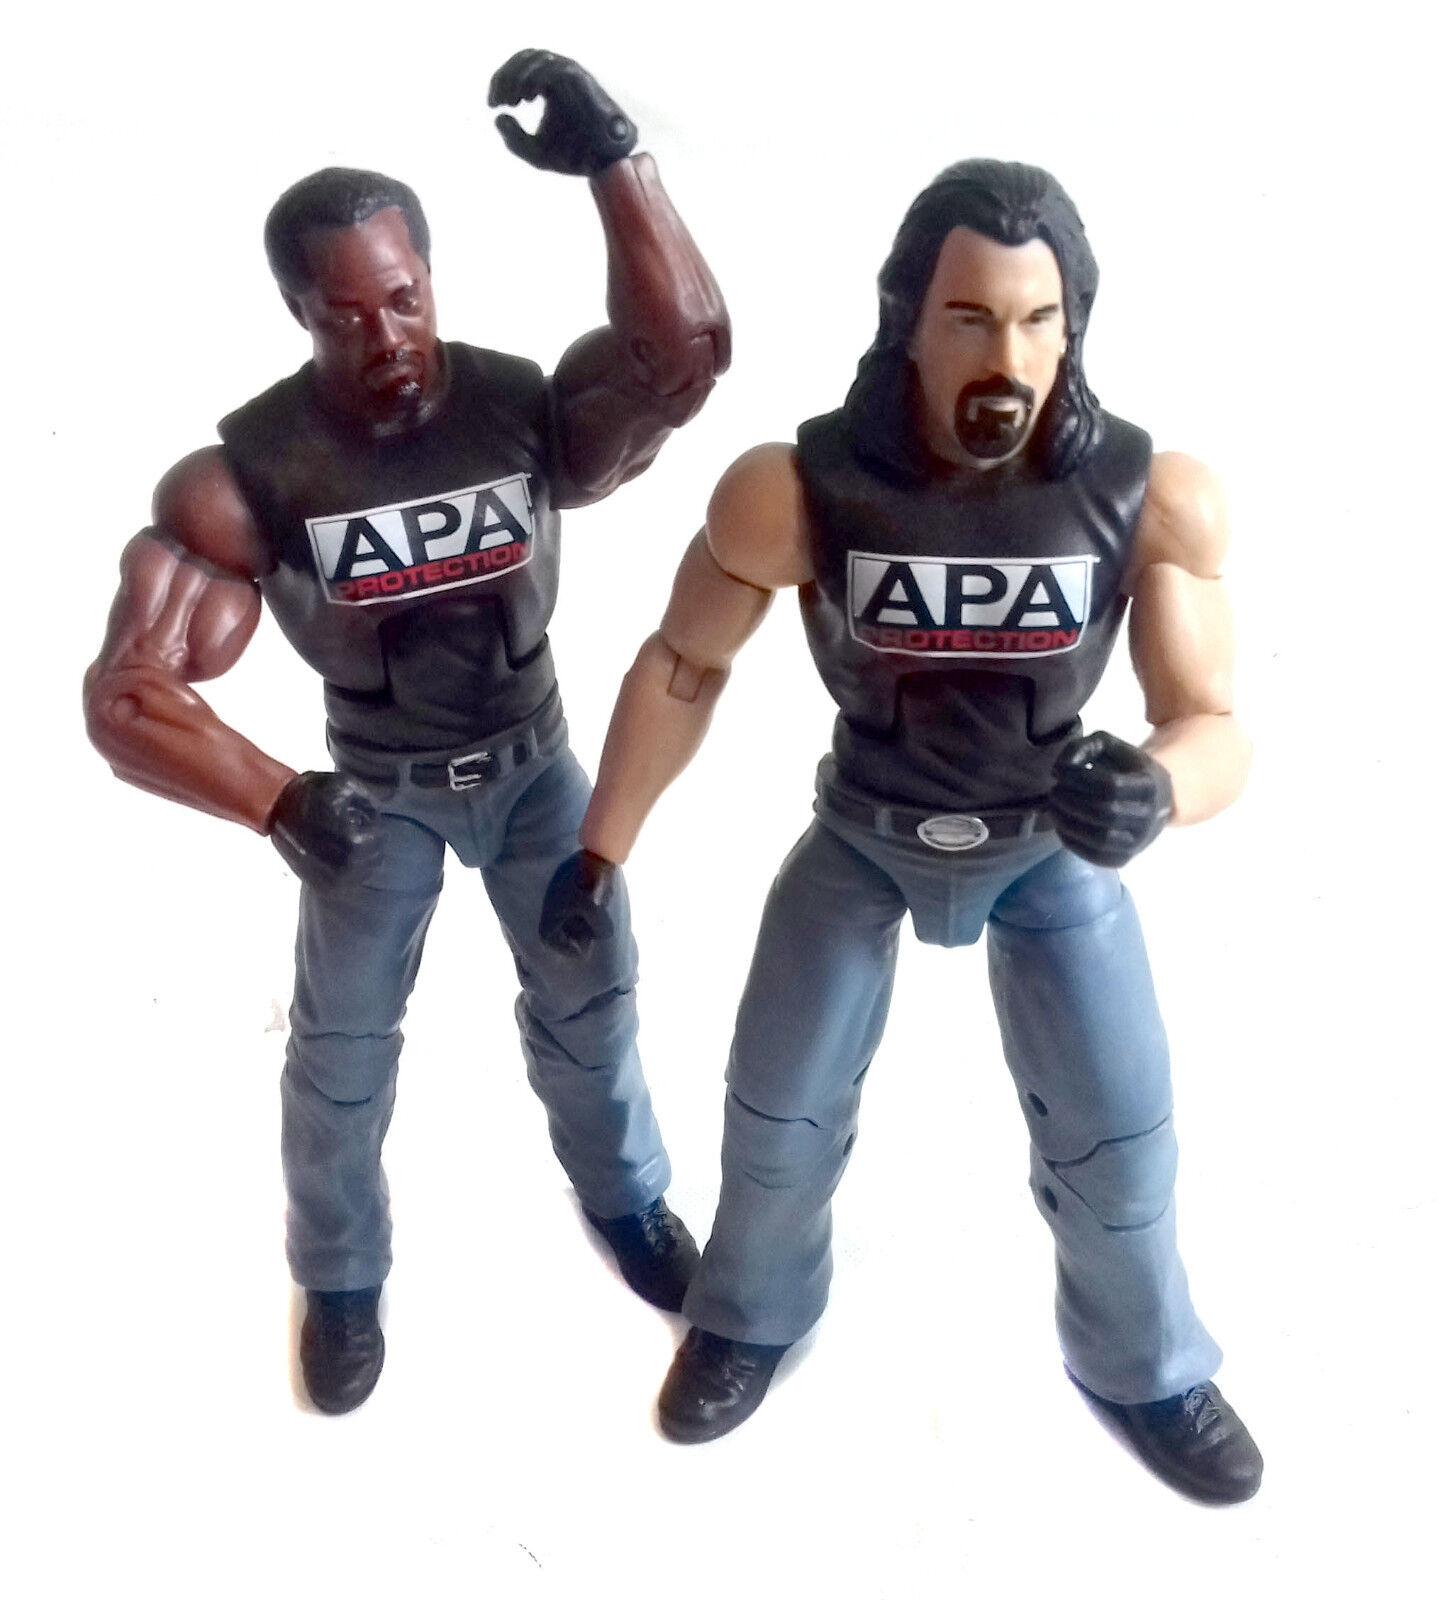 WWF WWE Wrestking APA PredECTION Tag Team 6  elite Superposeable figures Mattel